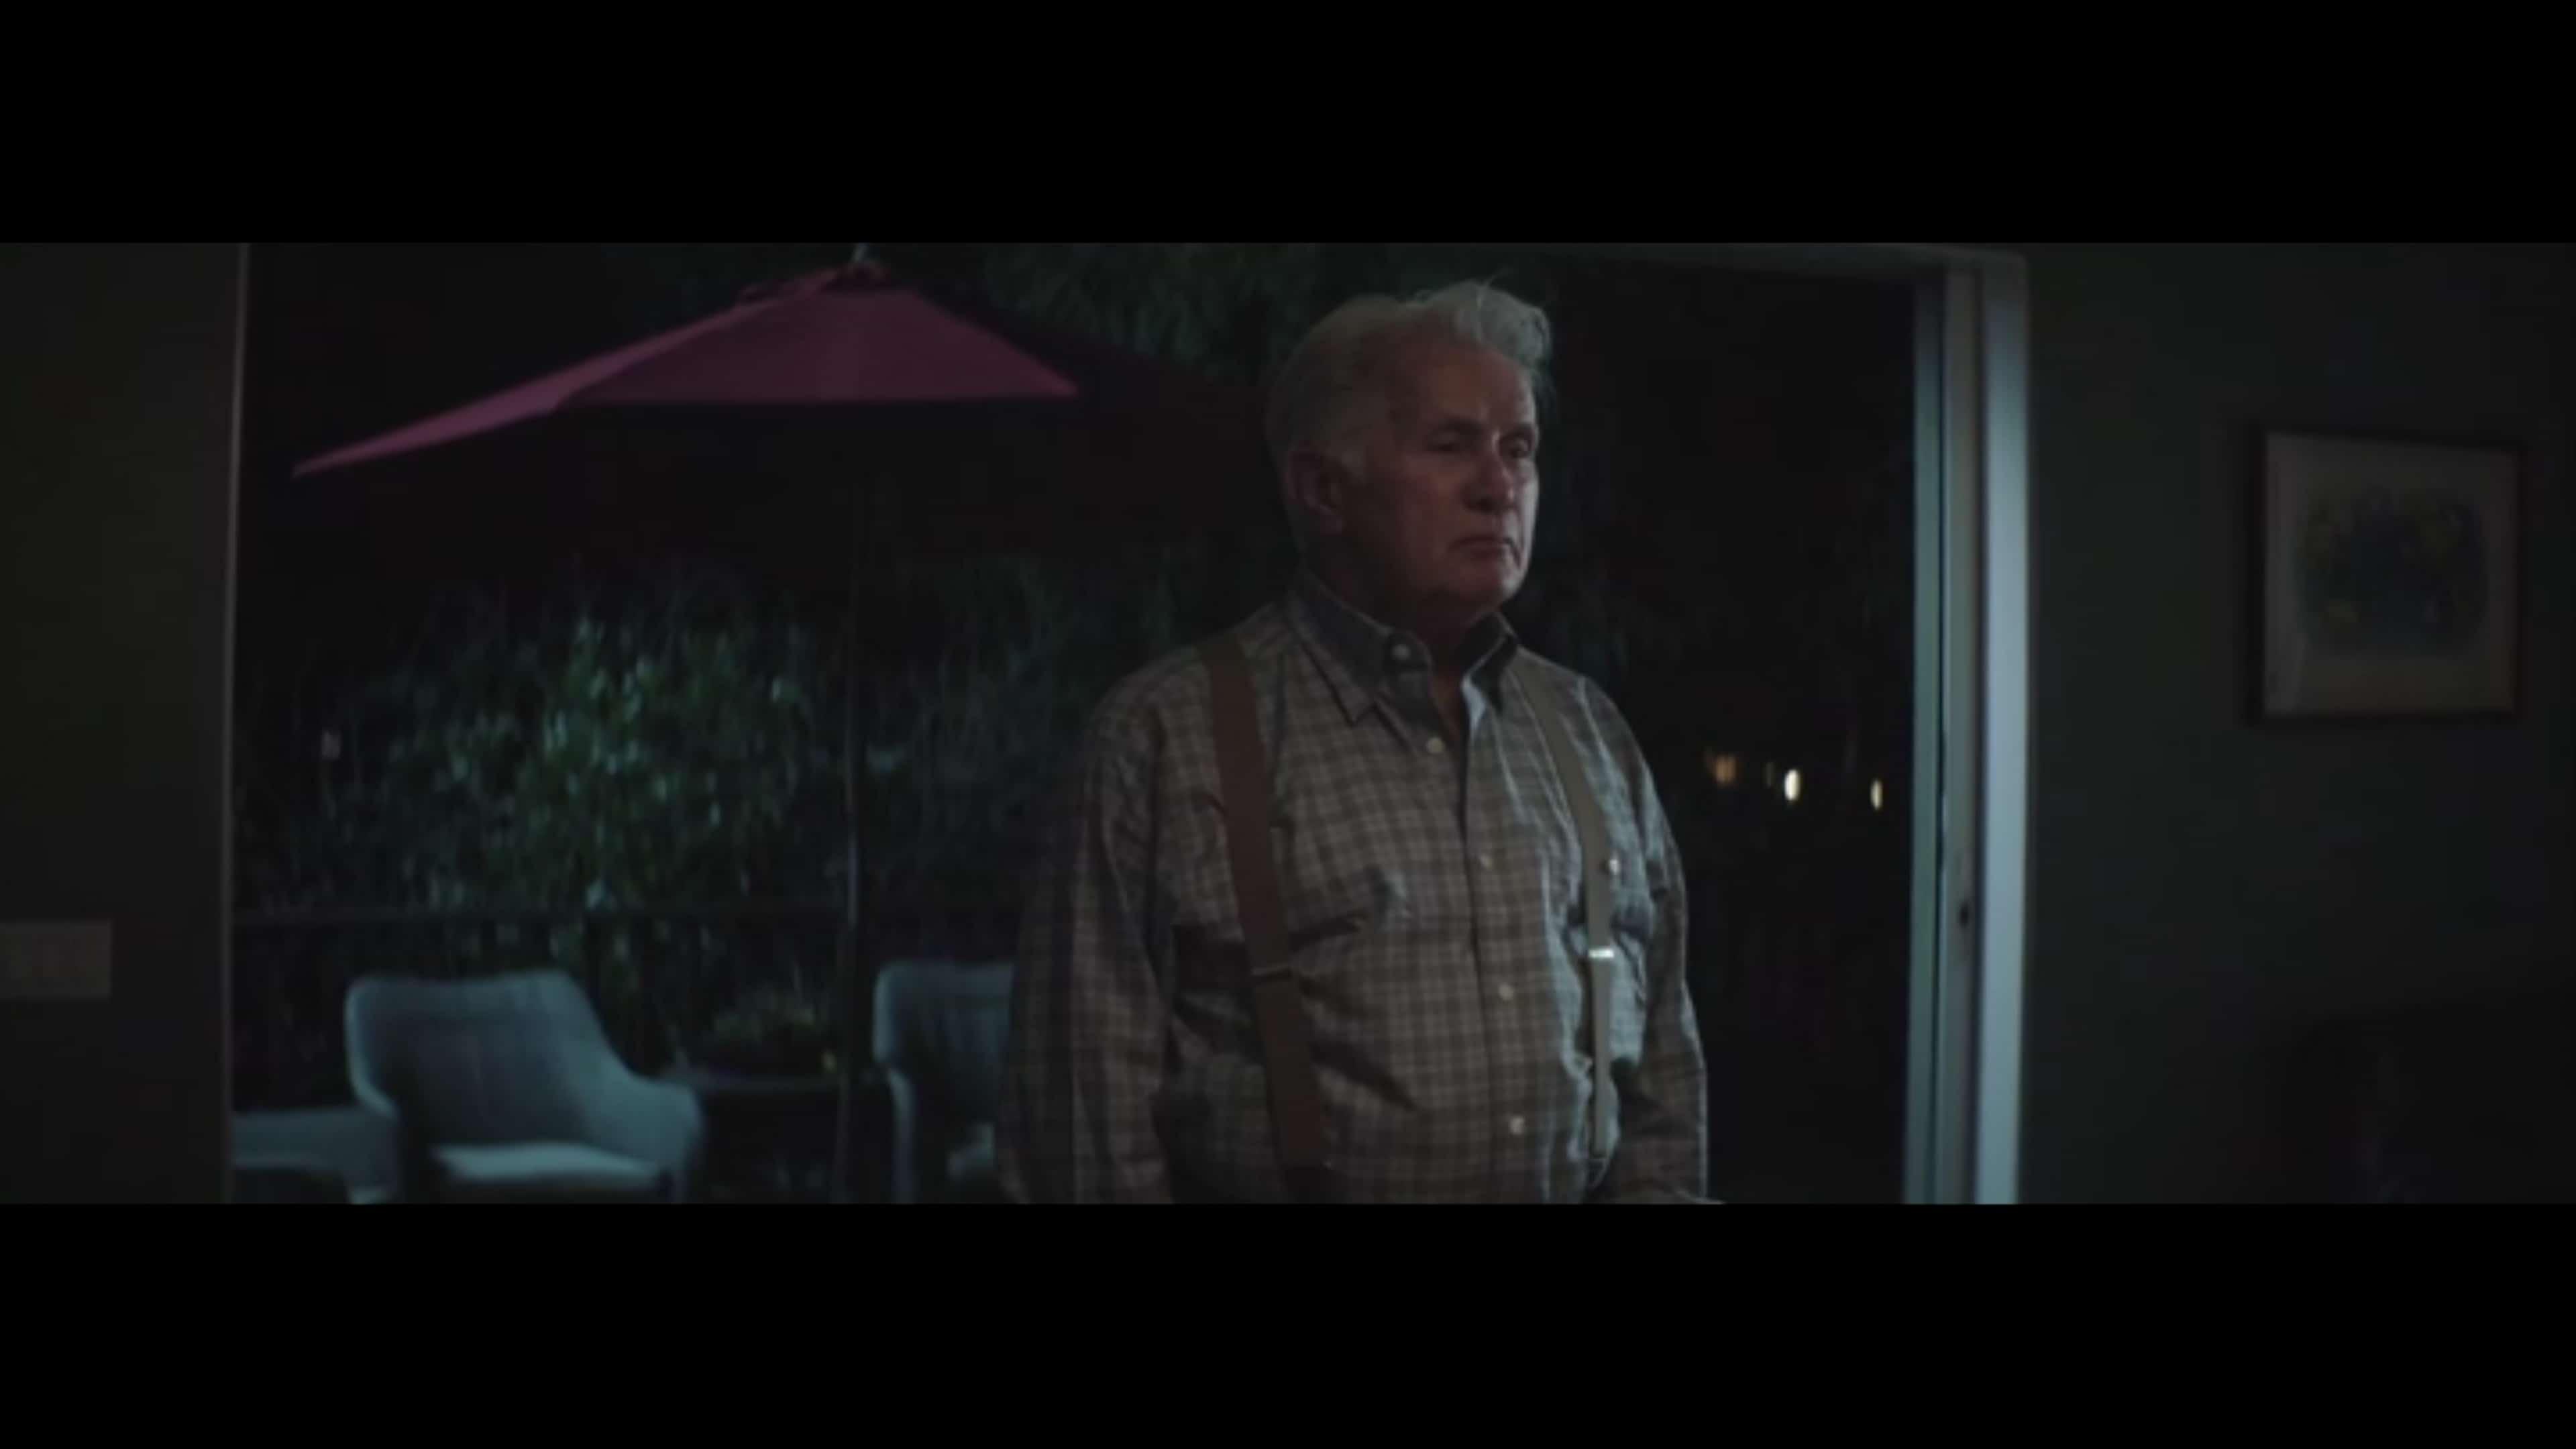 John (Martin Sheen) talking to Alicia